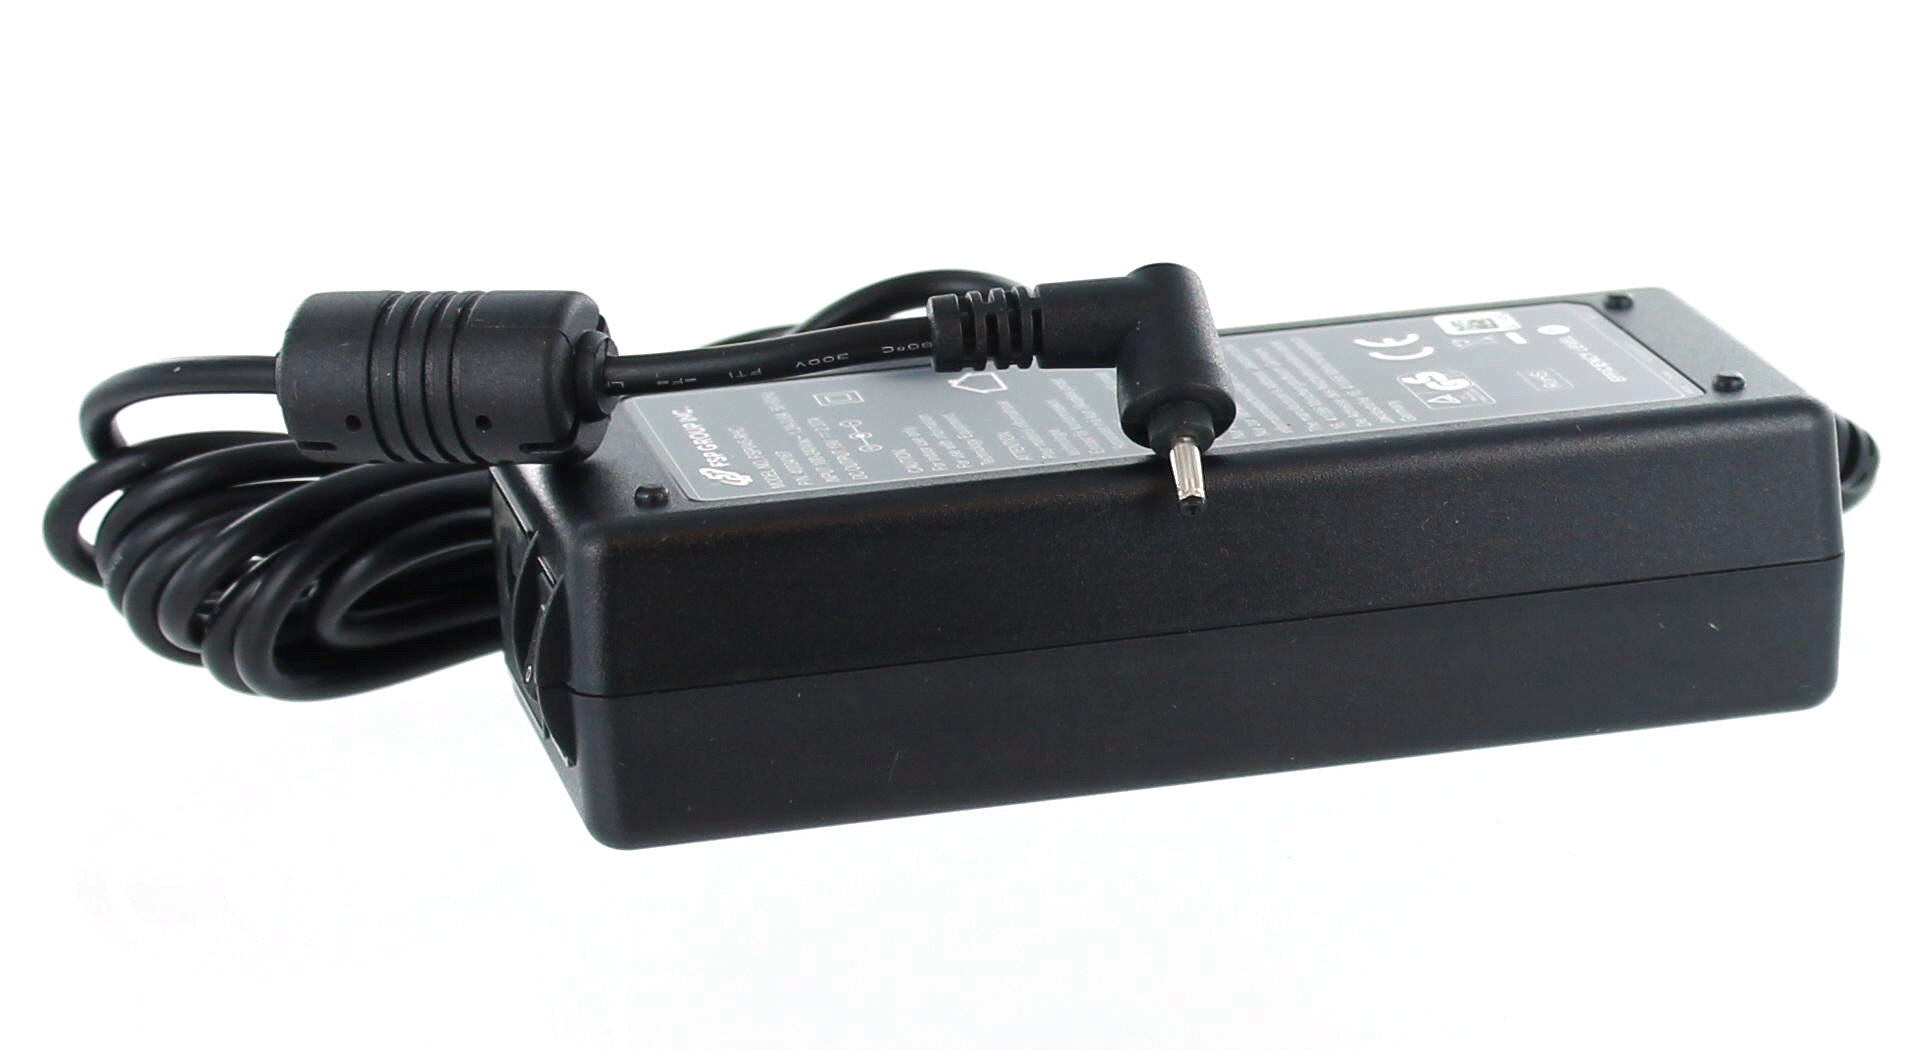 Netzteil kompatibel mit MEDION AKOYA E1232T kompatiblen